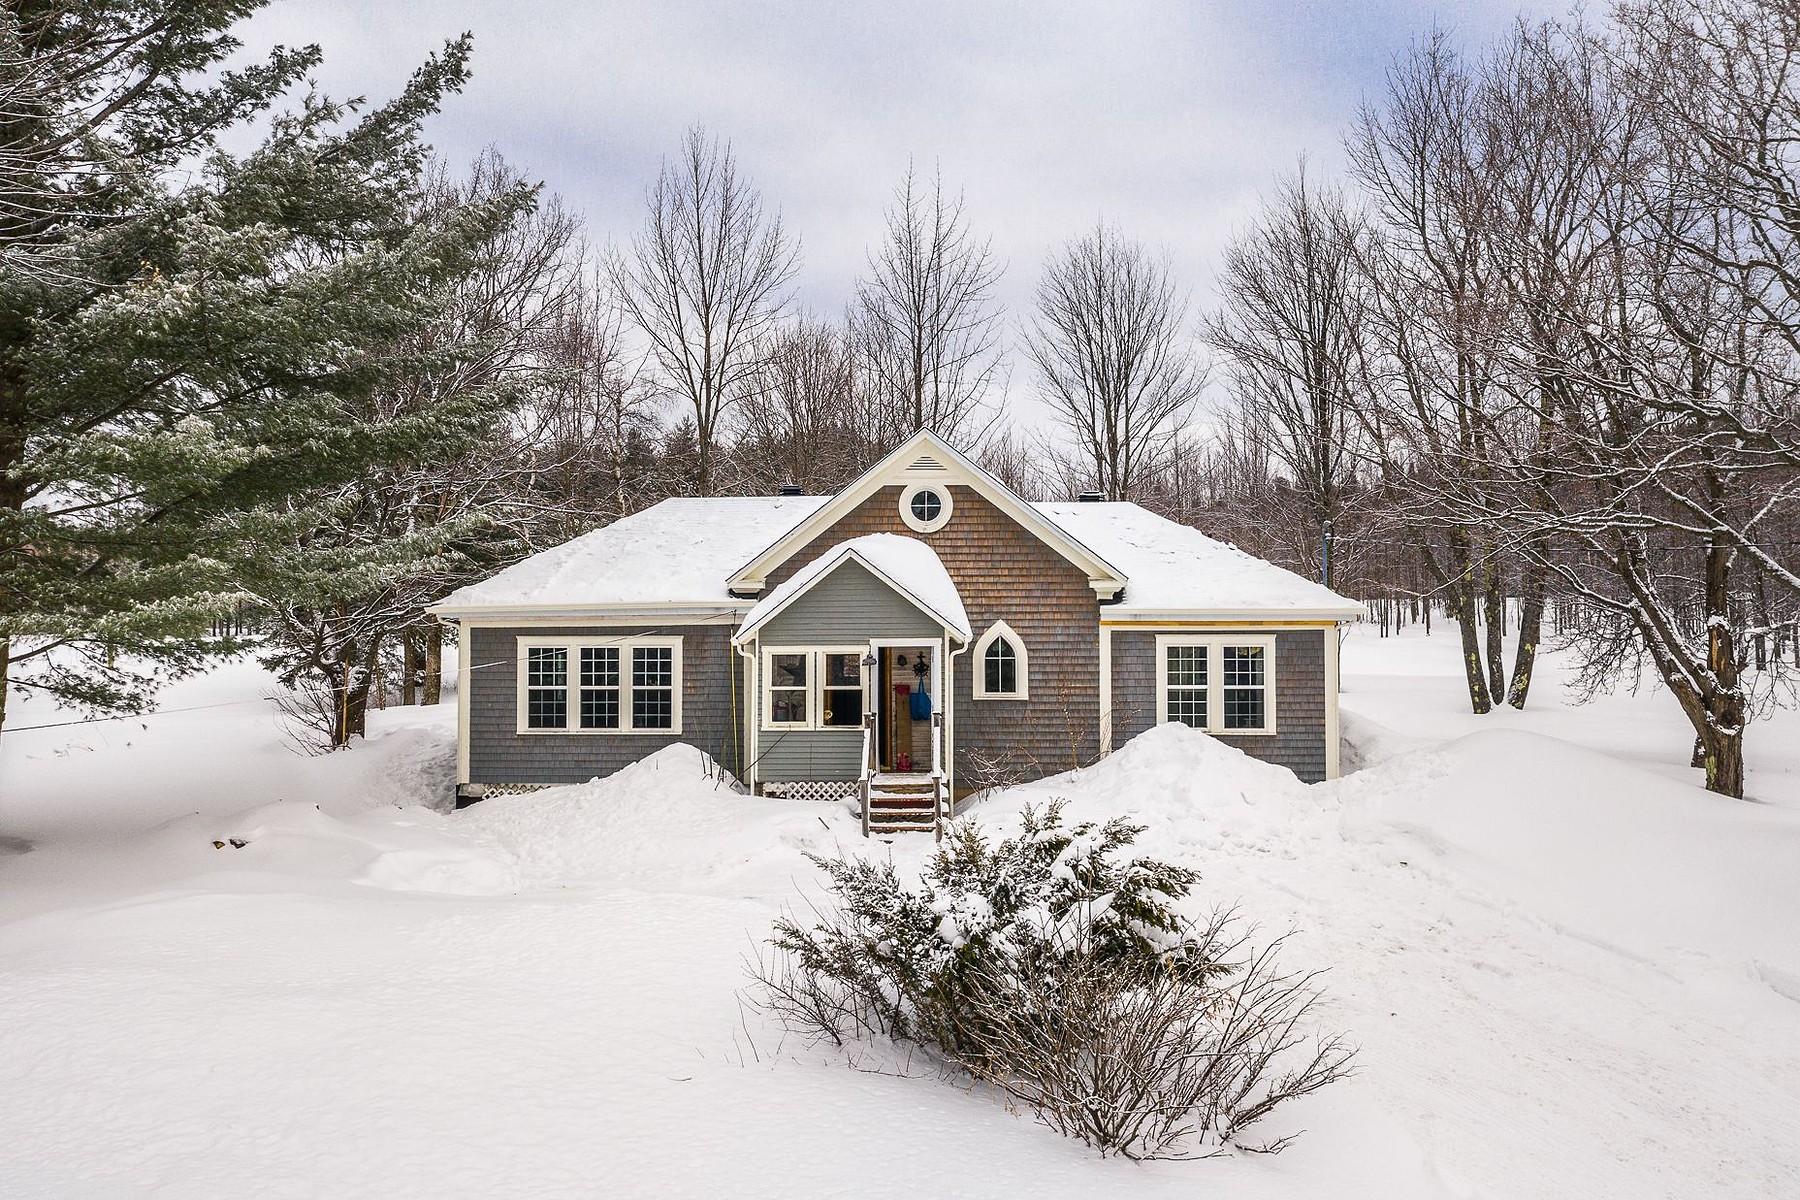 Single Family Homes for Sale at Magog, Estrie 971 Ch. des Pères Magog, Quebec J1X5R9 Canada